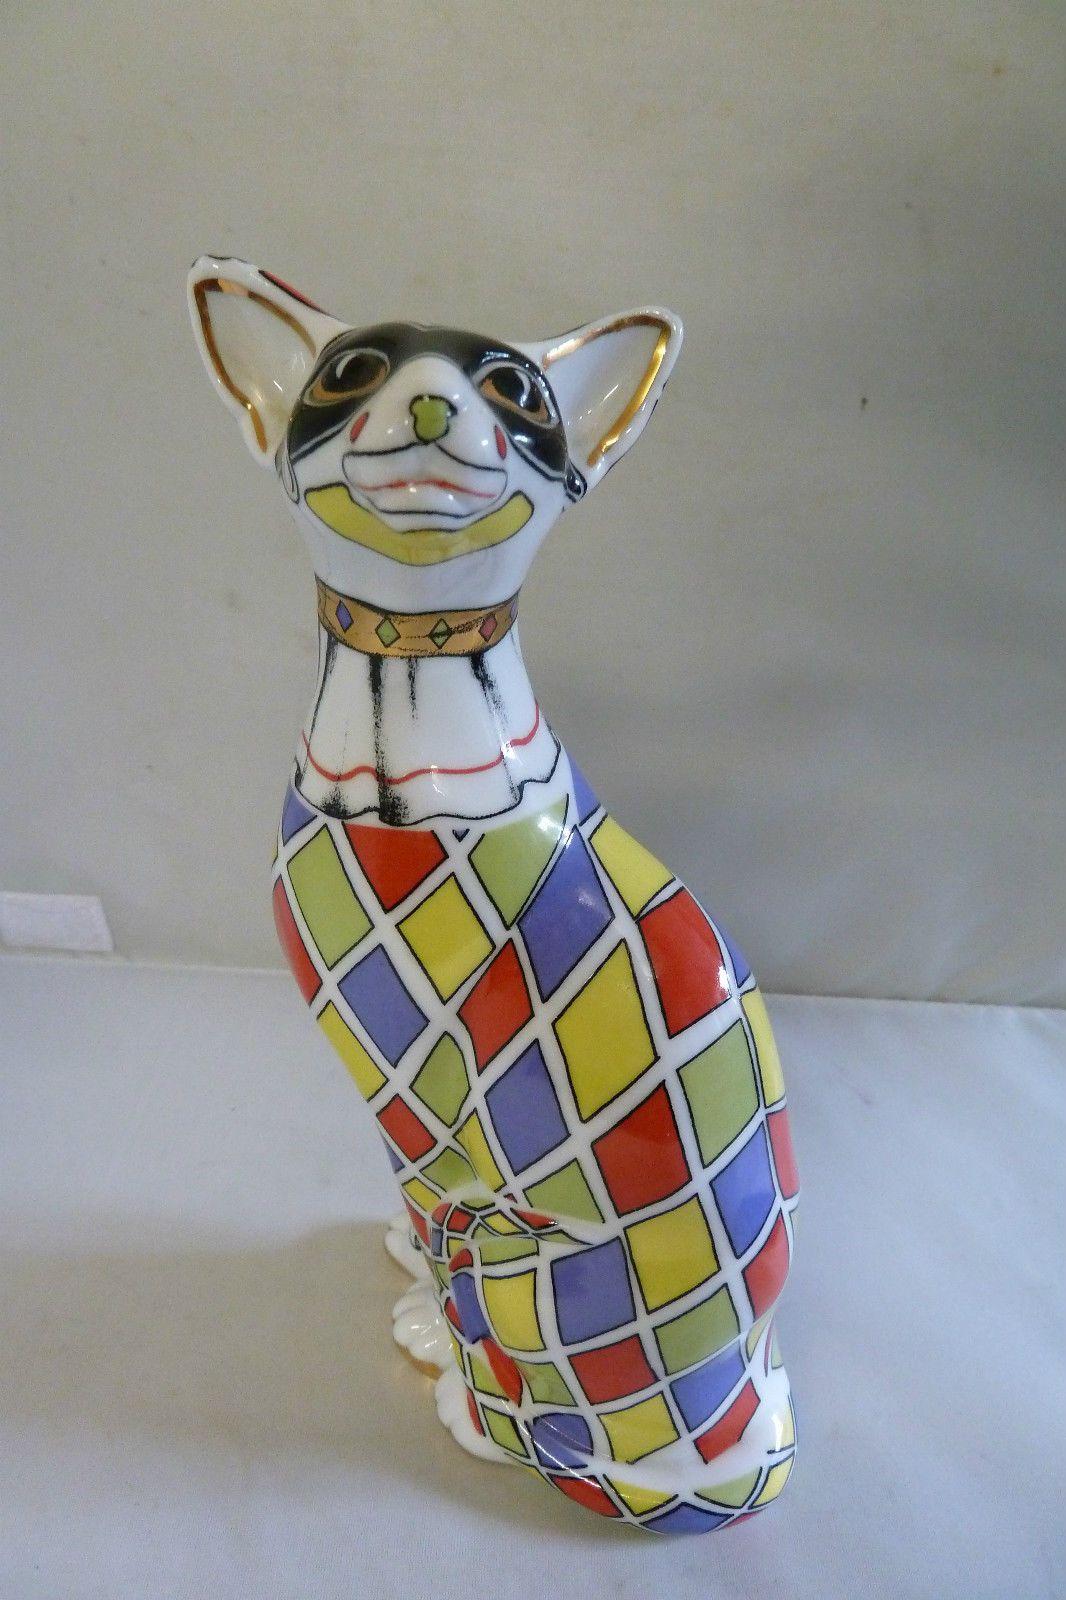 Paul Cardew Design Cool Catz Harlequin Sitting with Paws Porcelain Figurine | eBay